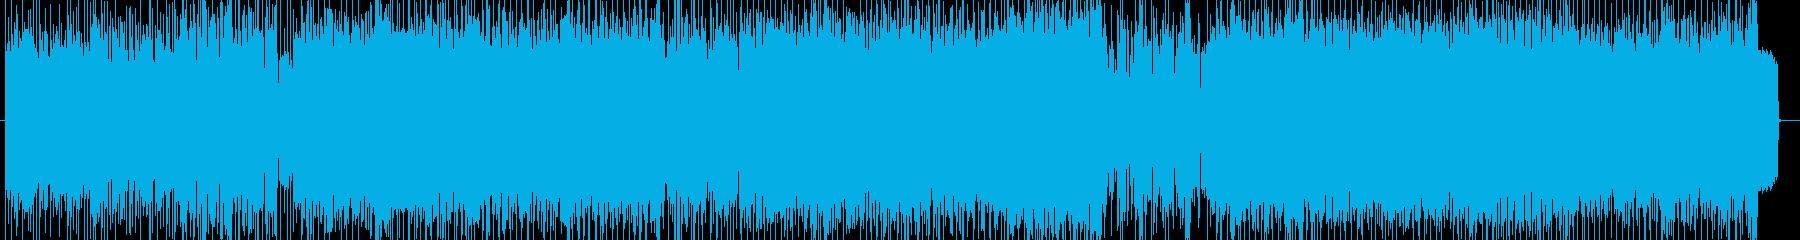 「HR/HM」「DARK」BGM90の再生済みの波形